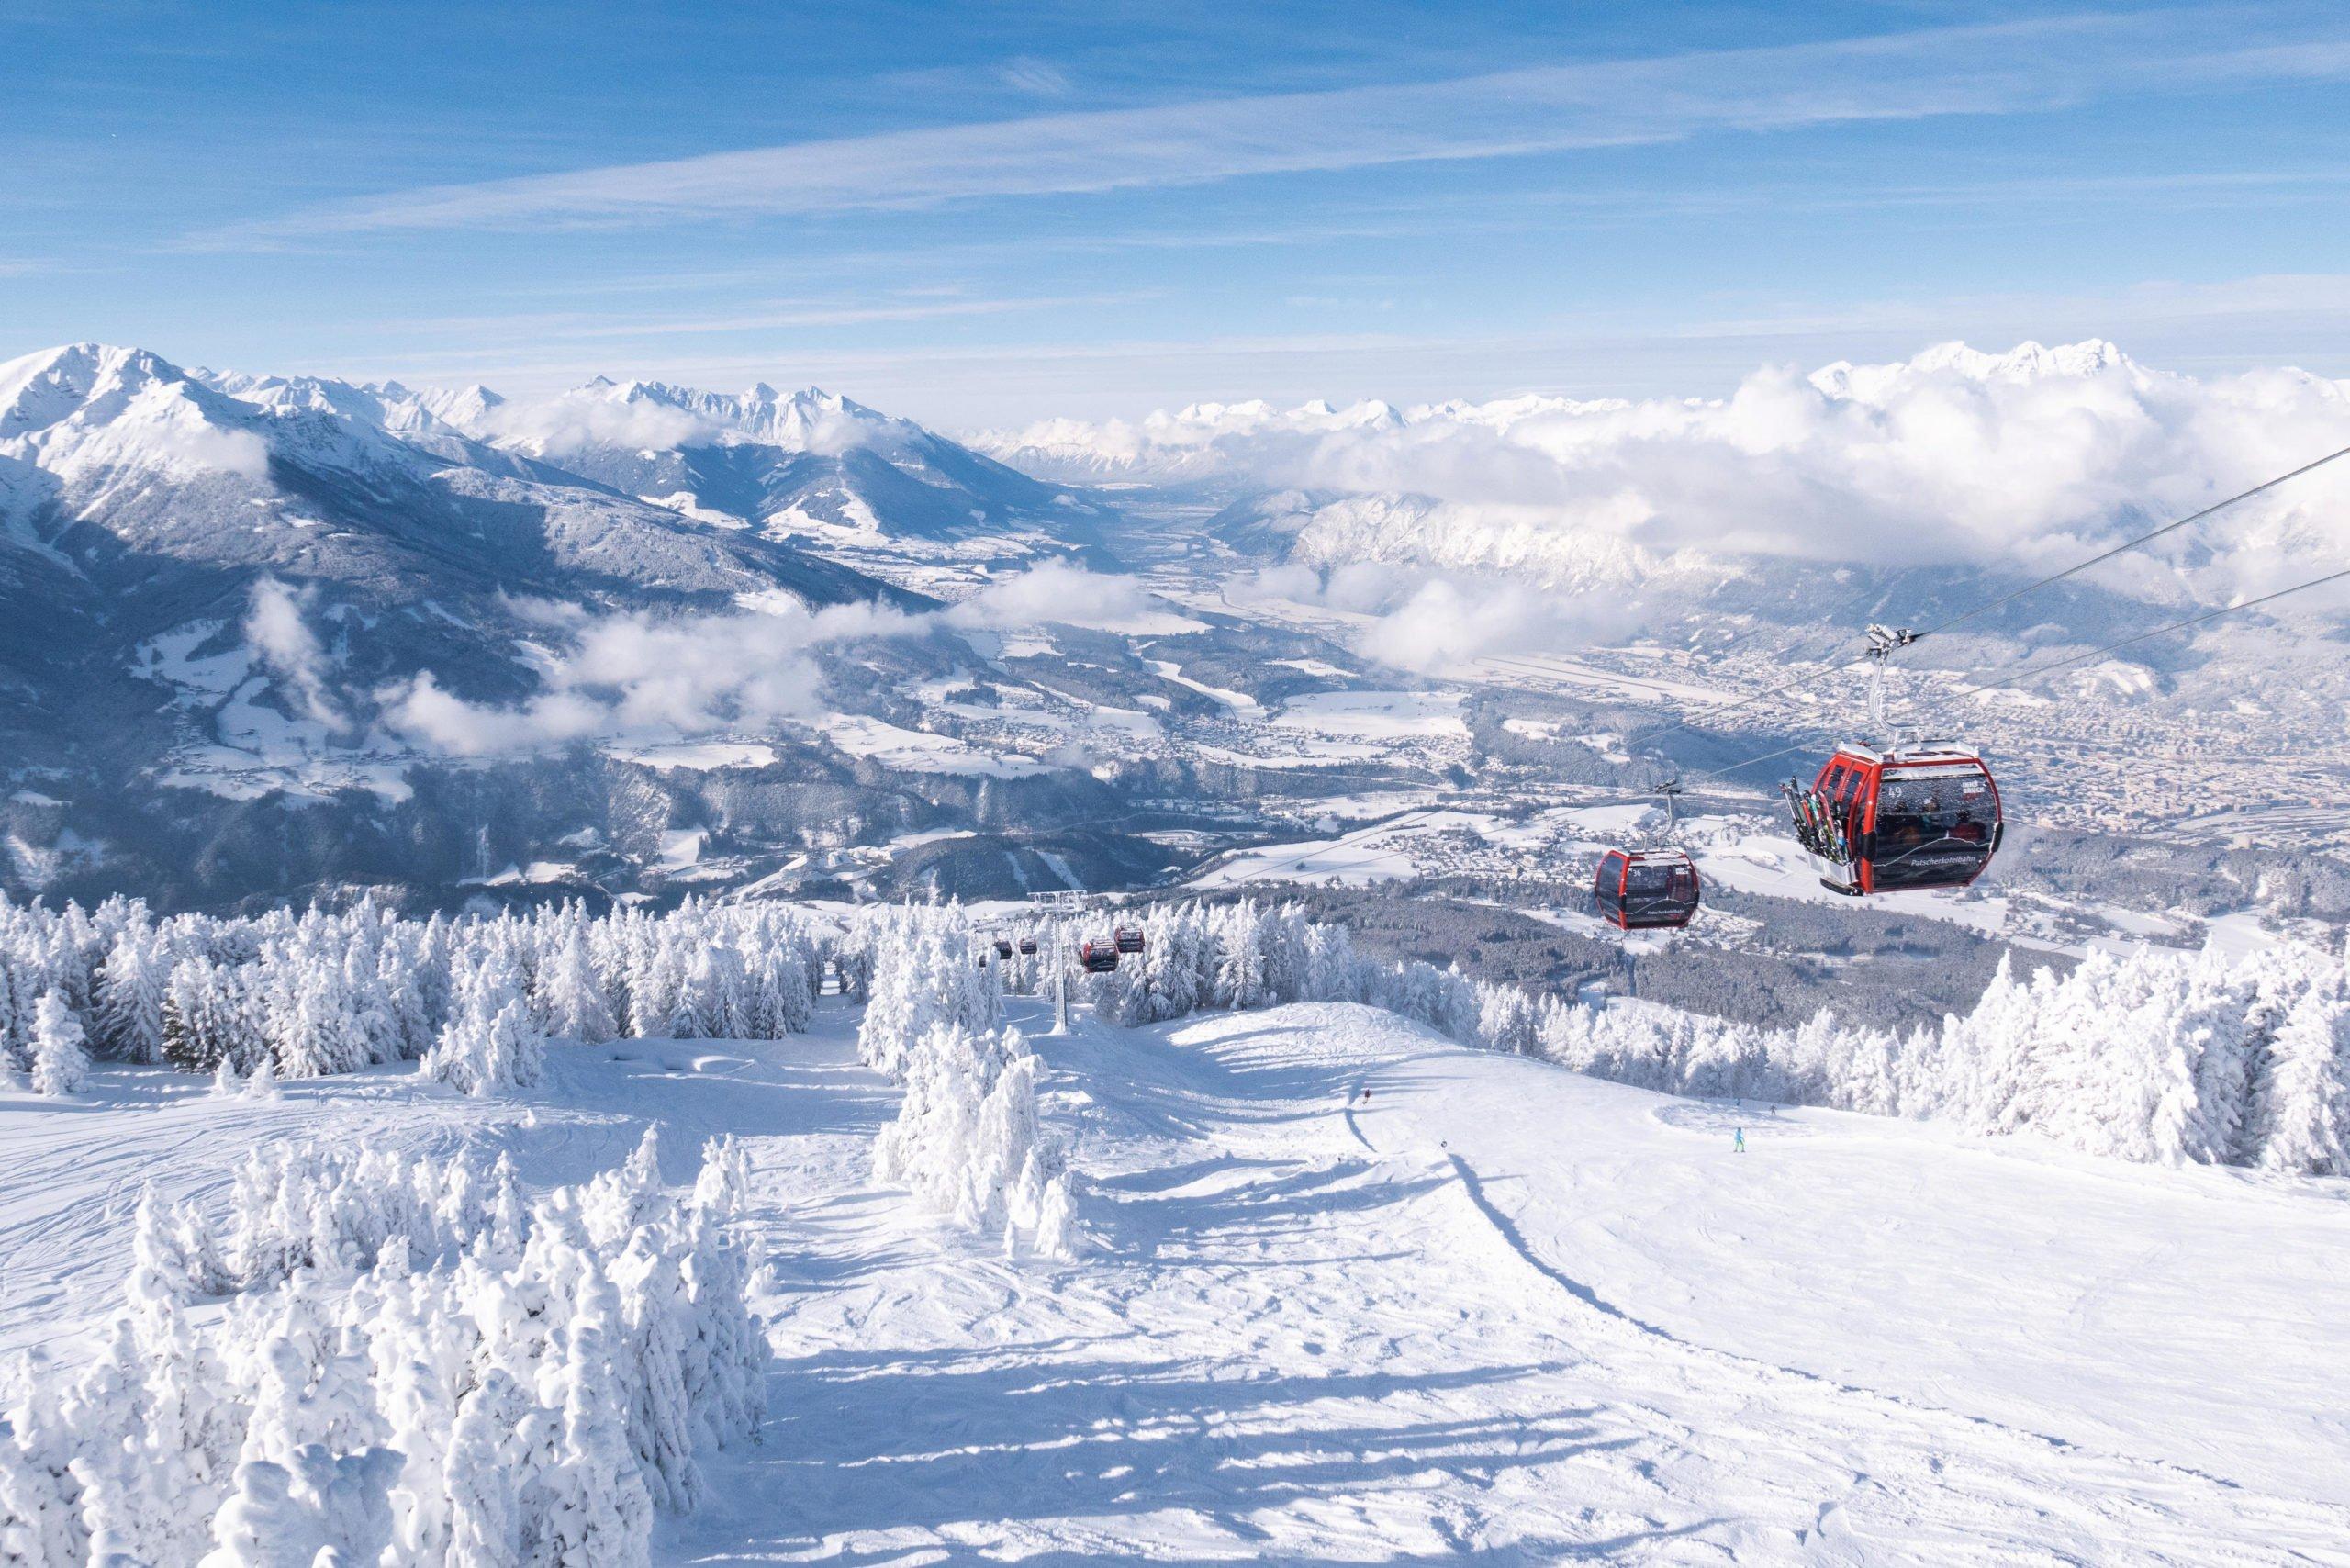 Gondola Things To Do in Innsbruck